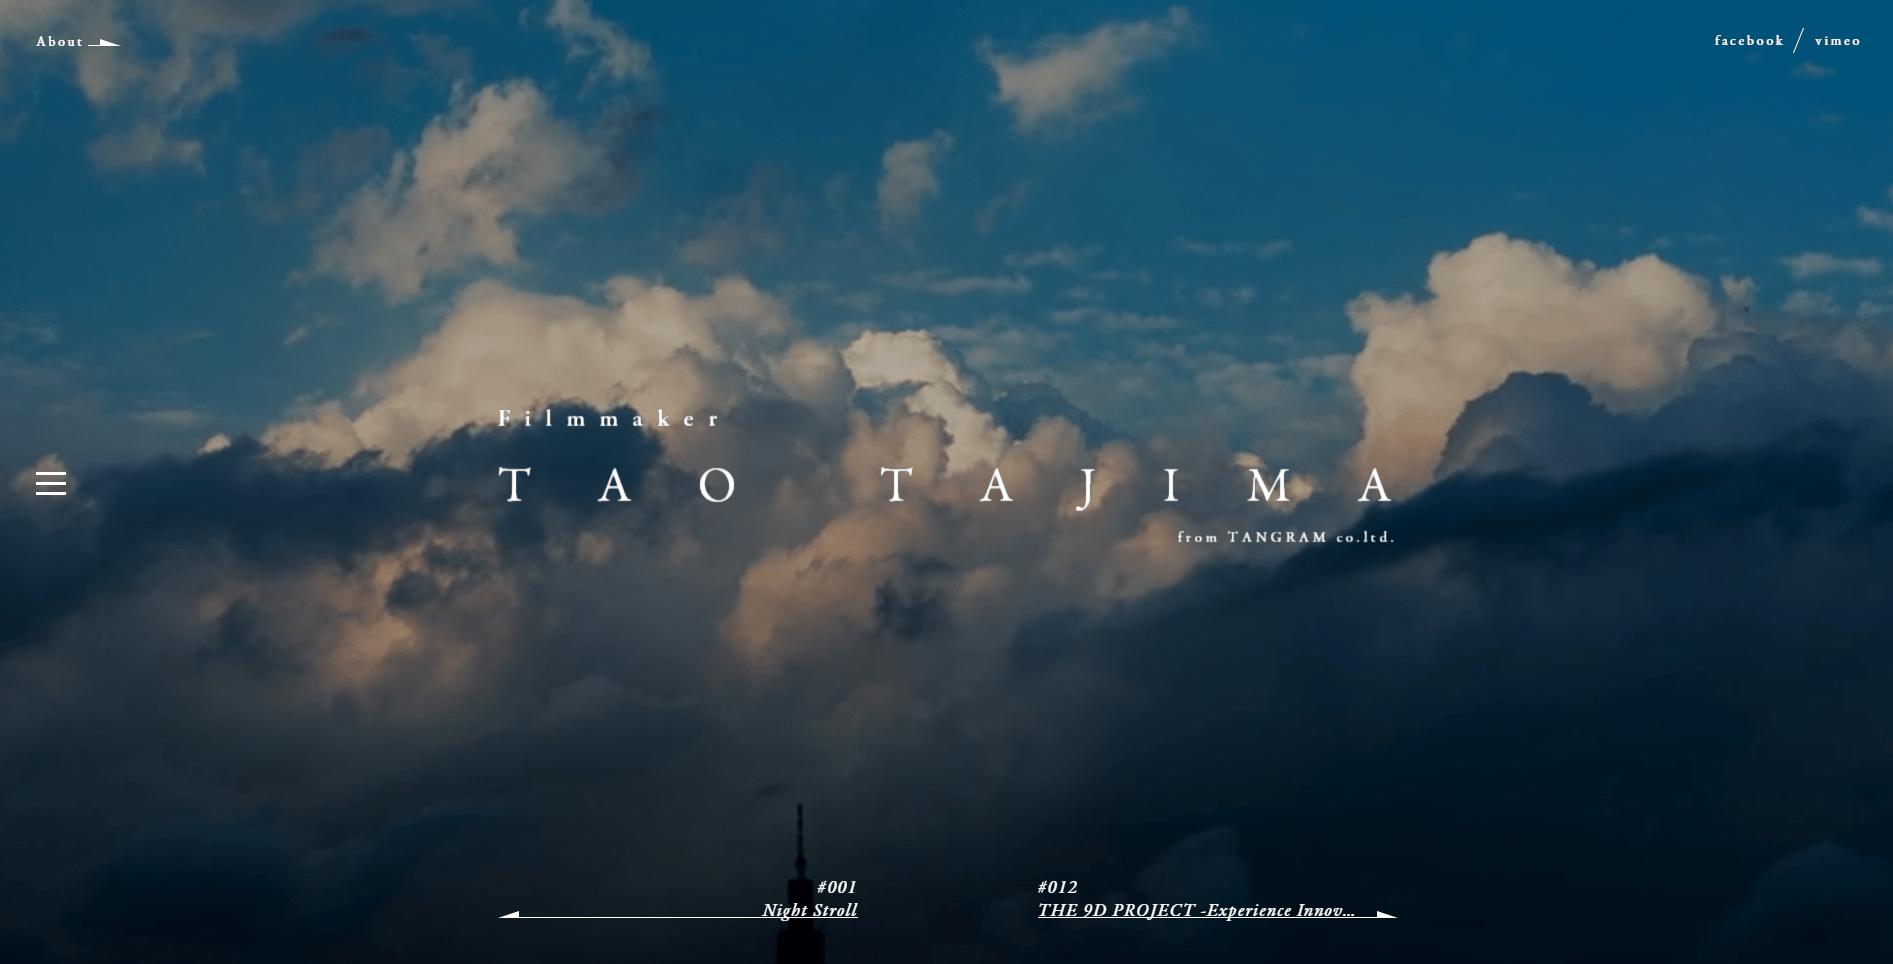 site Tao Tajima - 9 sites incríveis para você se inspirar